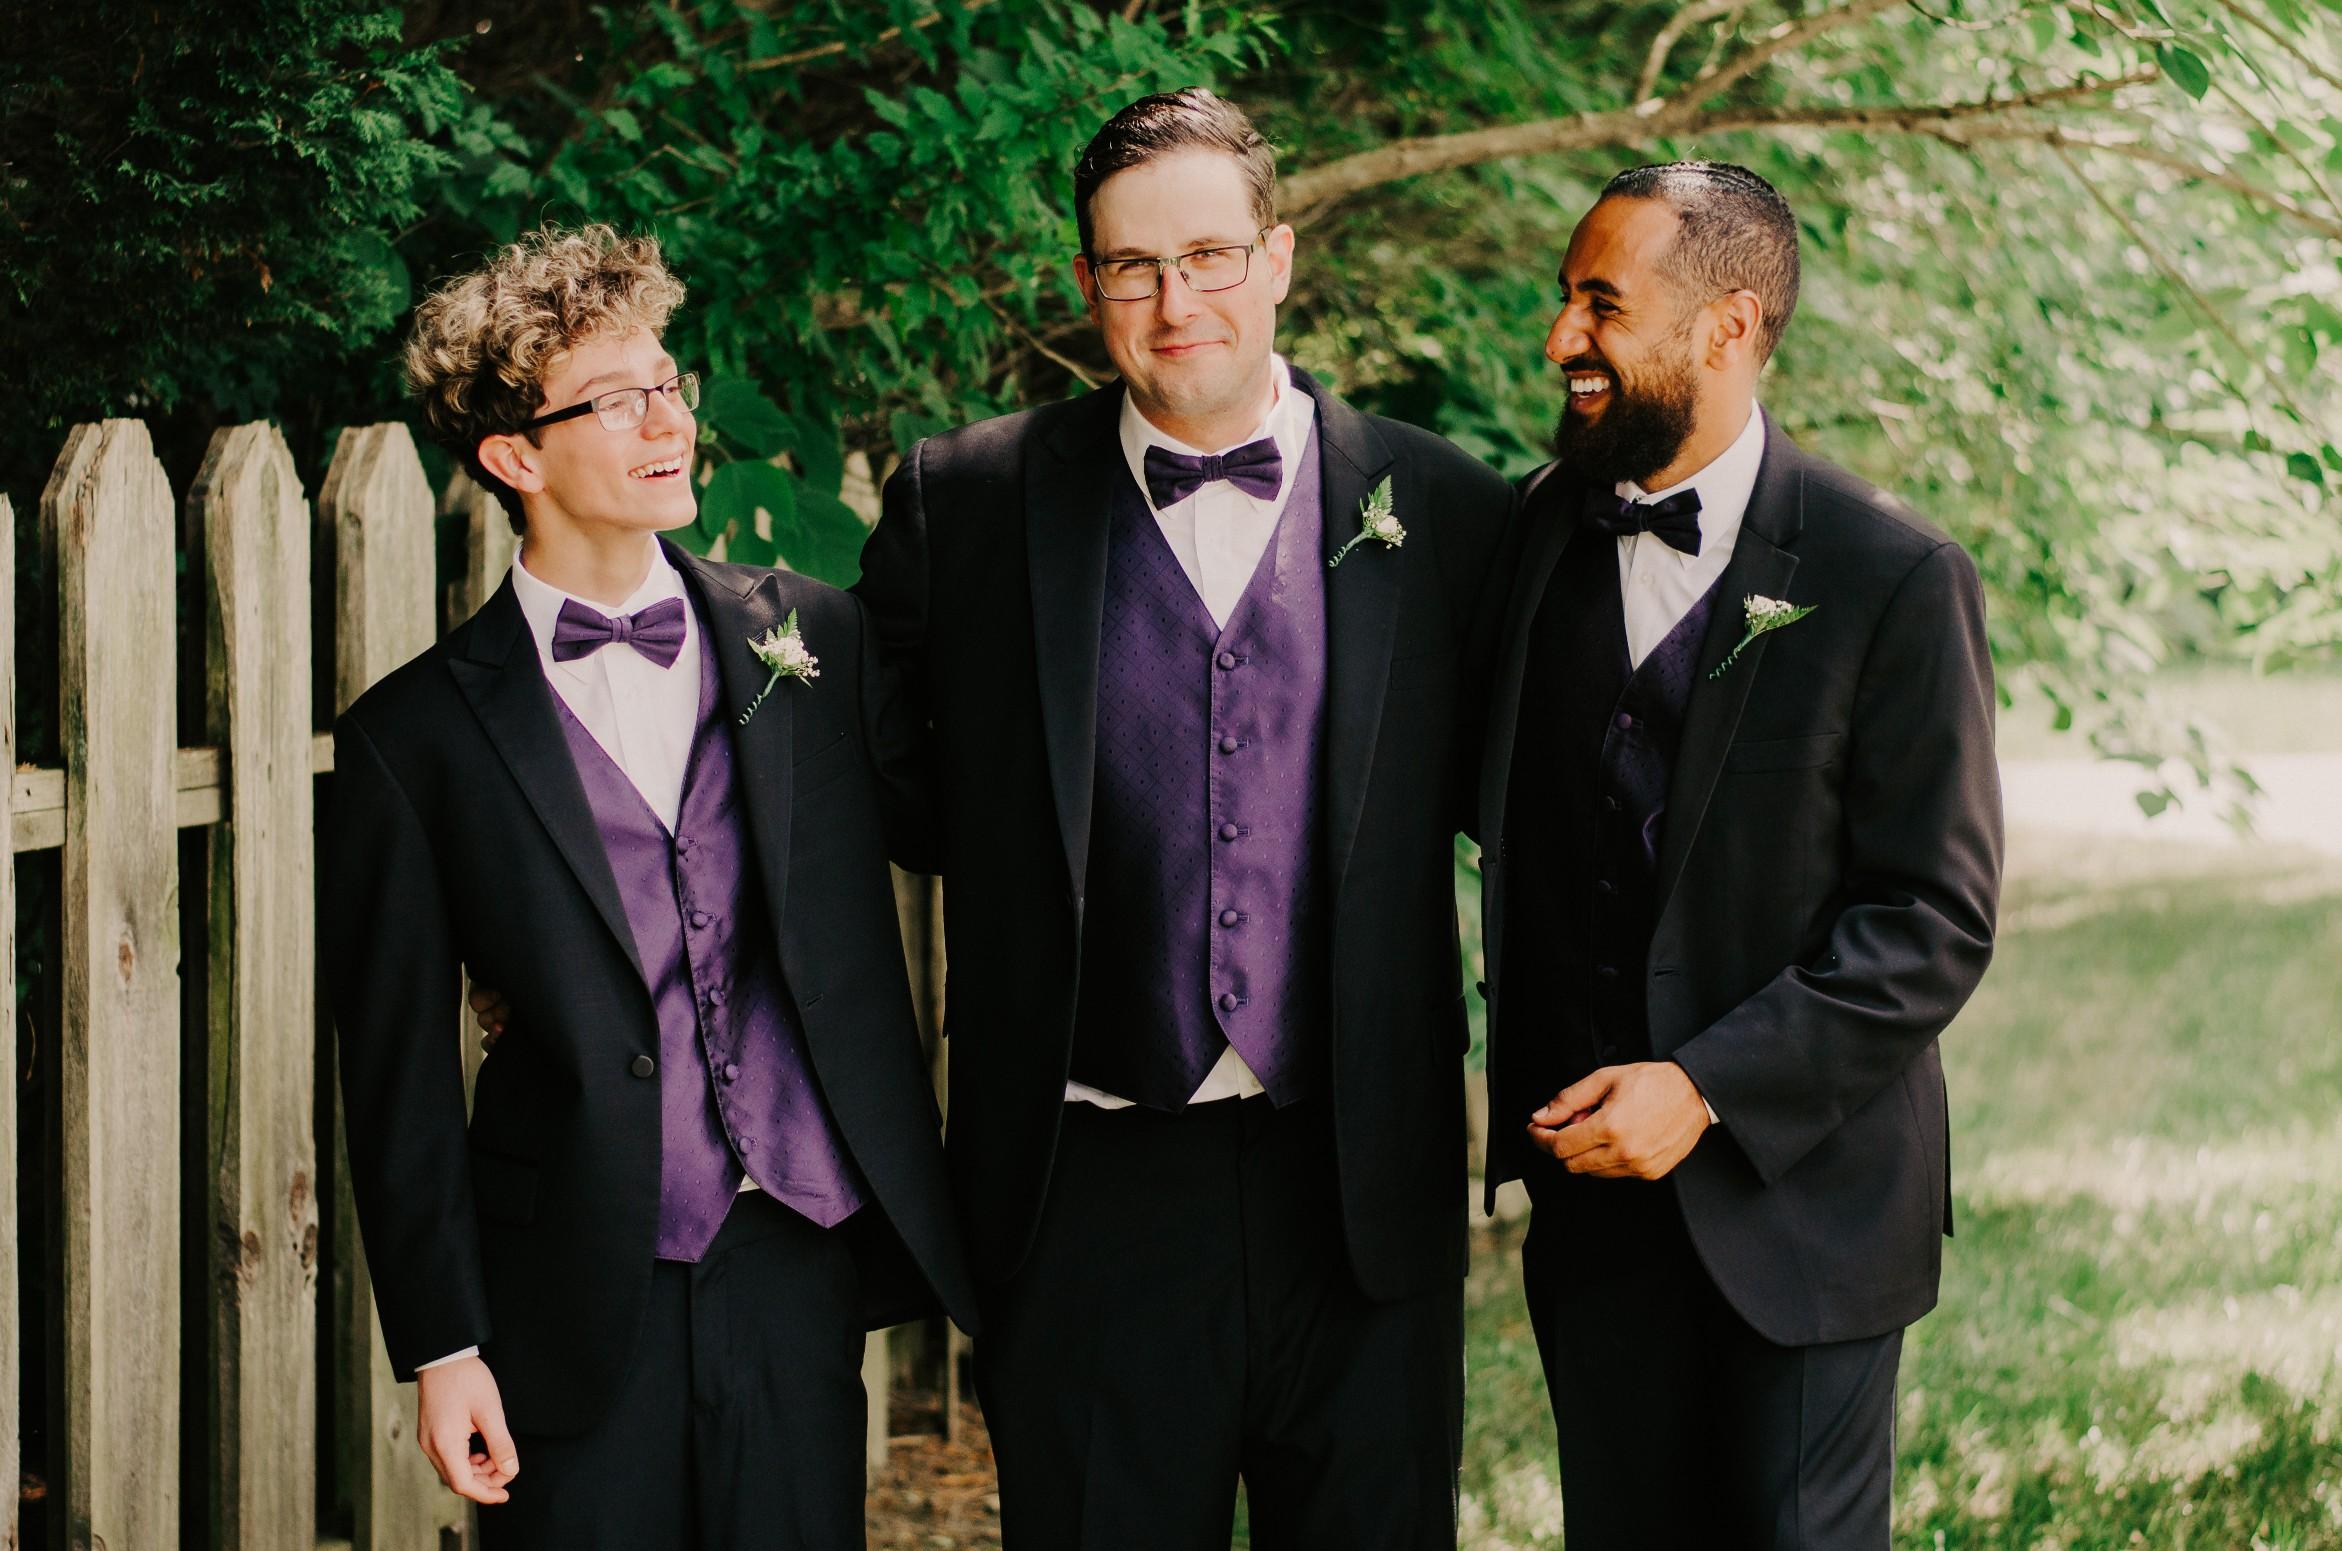 groom-portraits-wedding-photography.jpg.